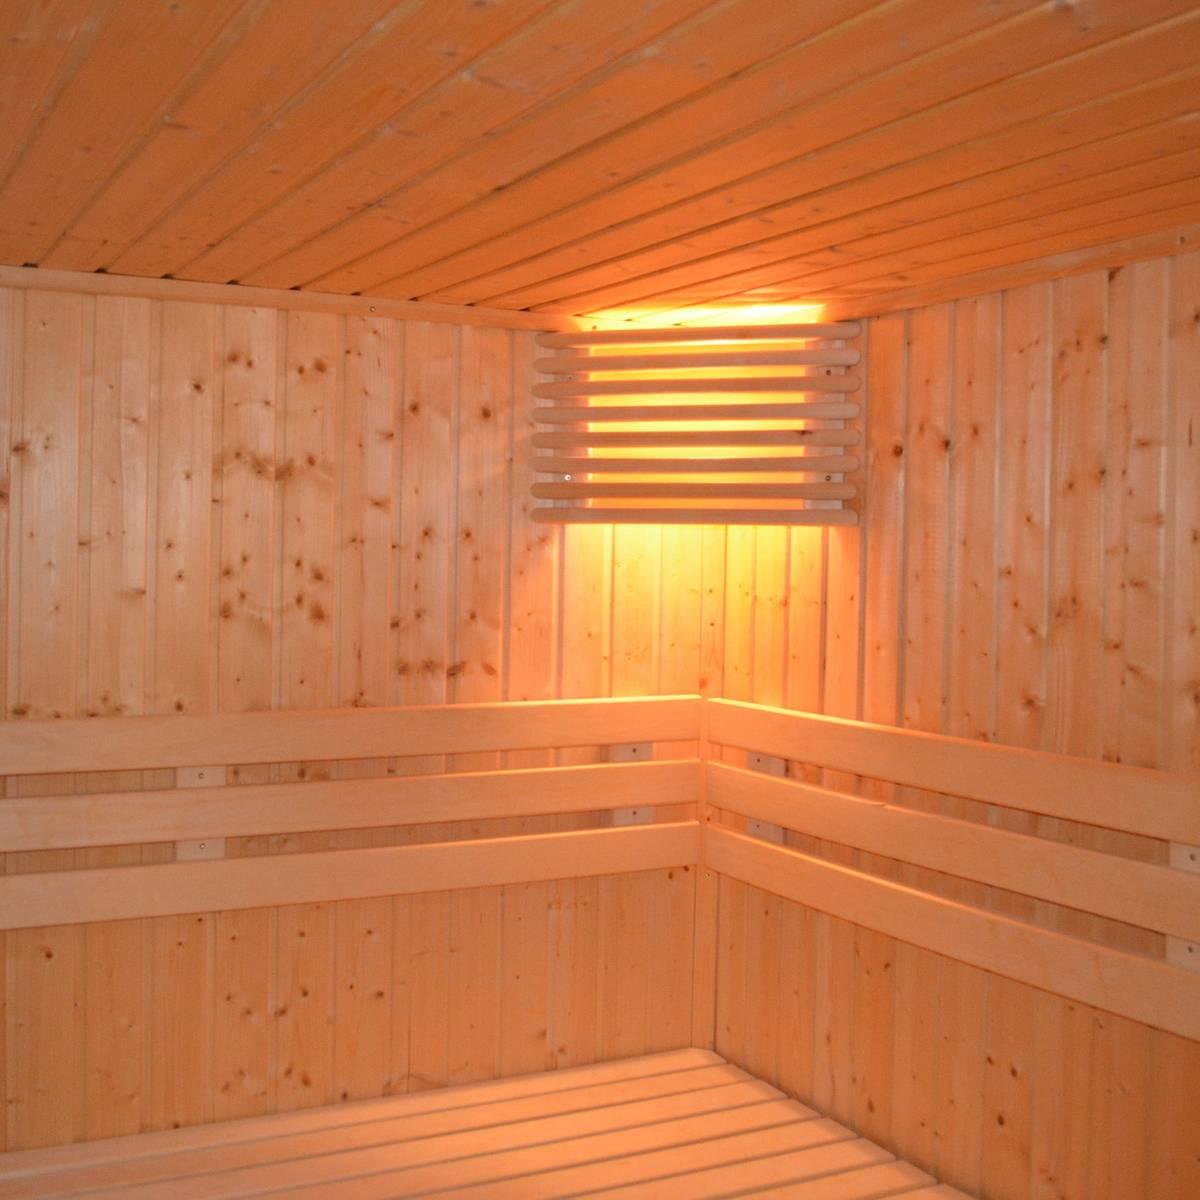 Corona Sauna Nrw